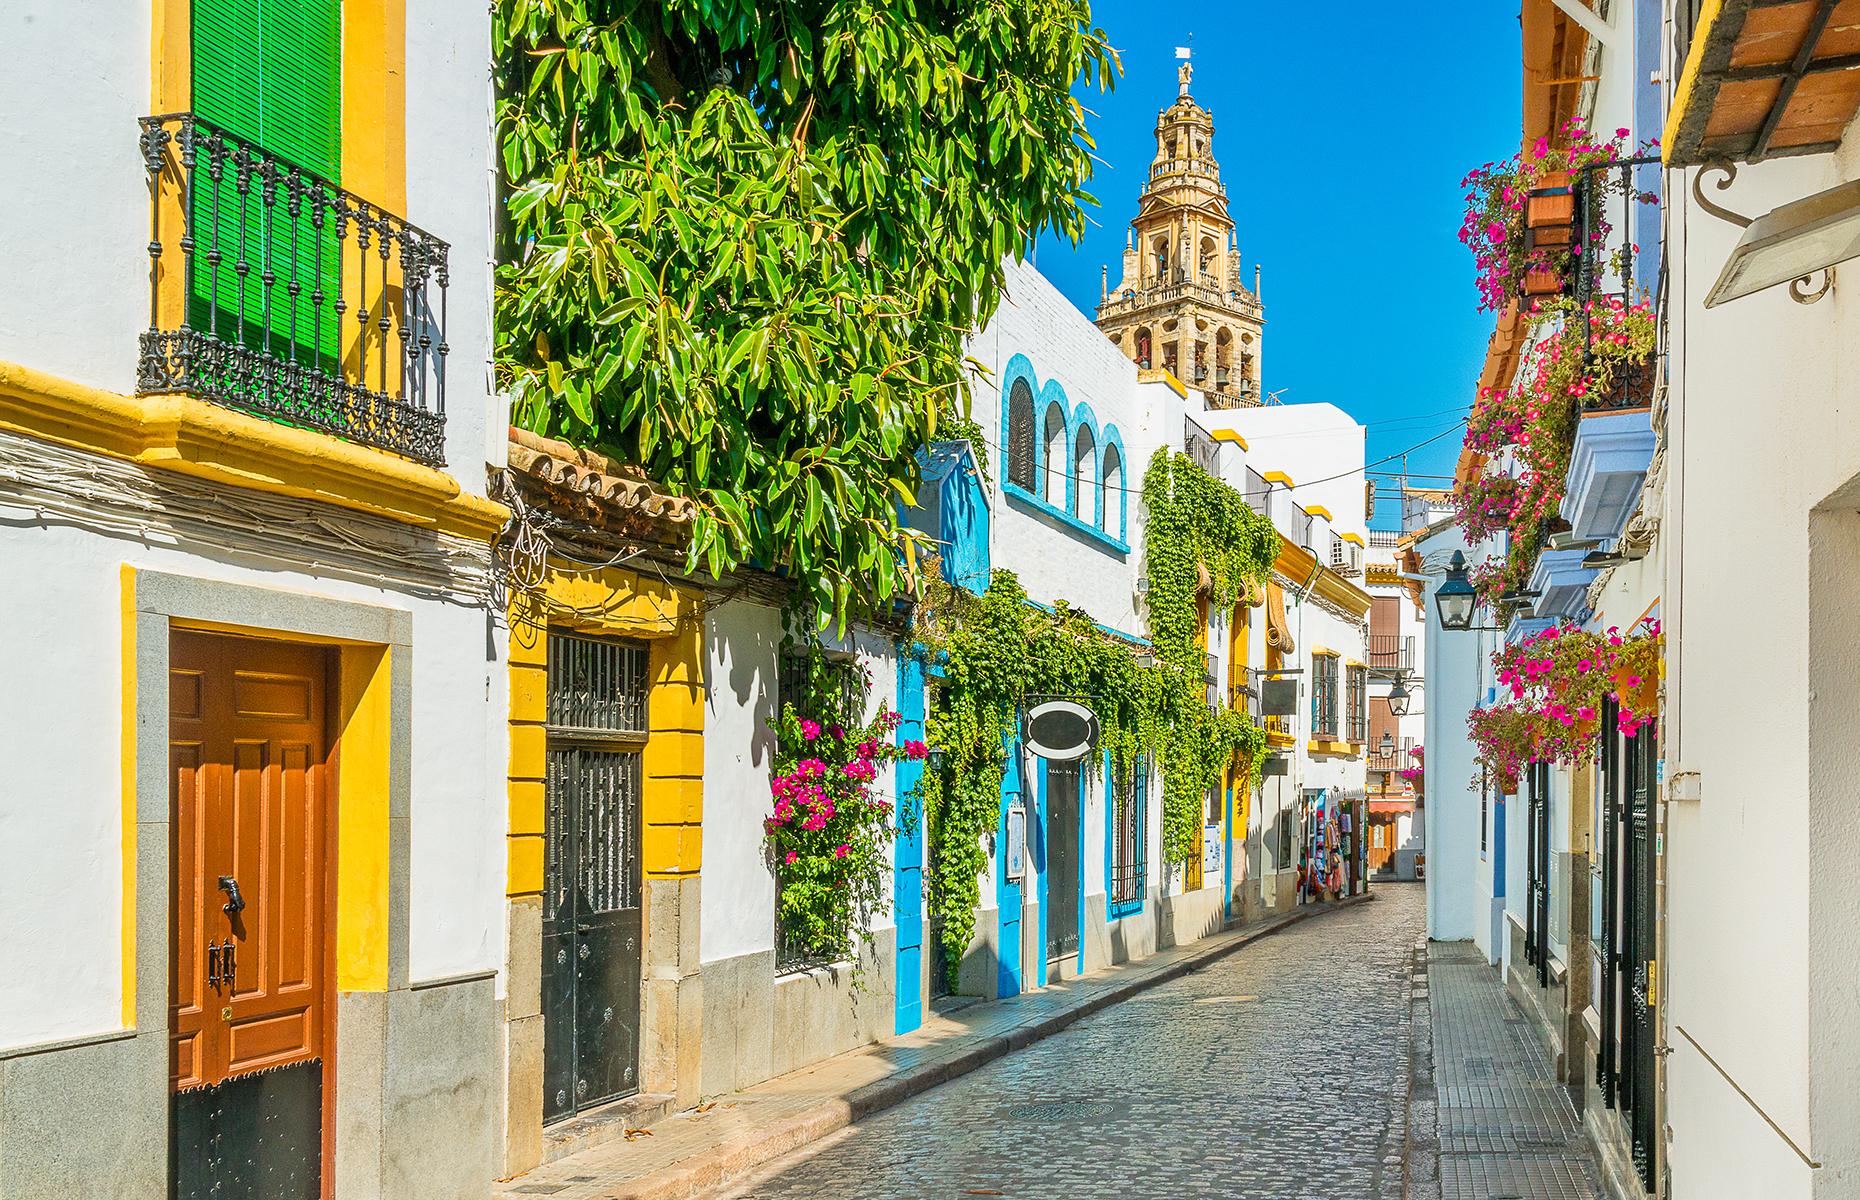 Judería de Córdoba (Image: Stefano_Valeri/Shutterstock)